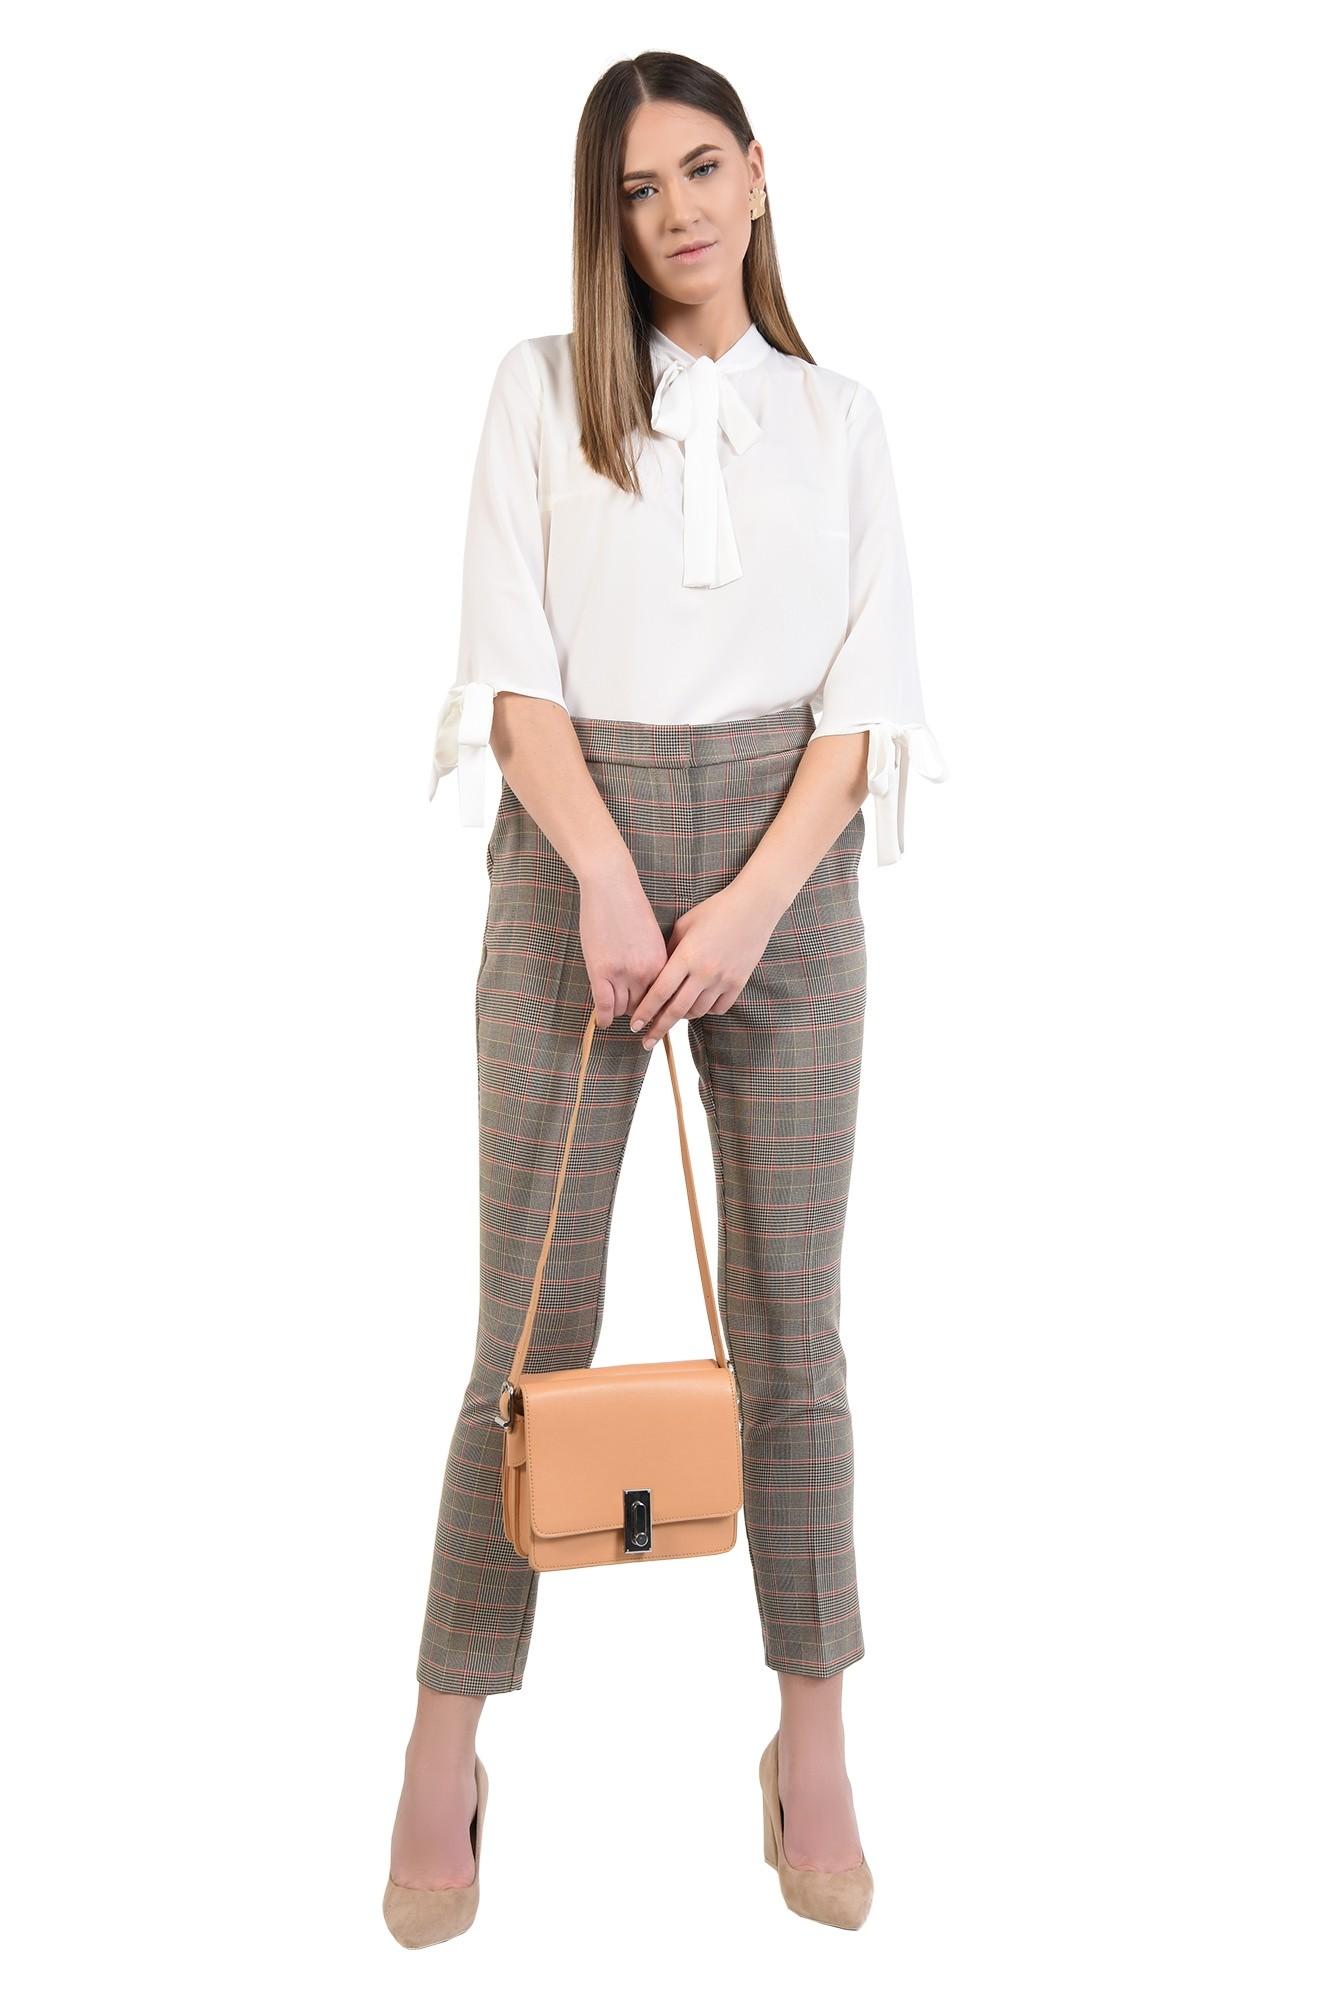 3 - 360 - pantaloni de costum, in carouri, conici, buzunare in cusatura